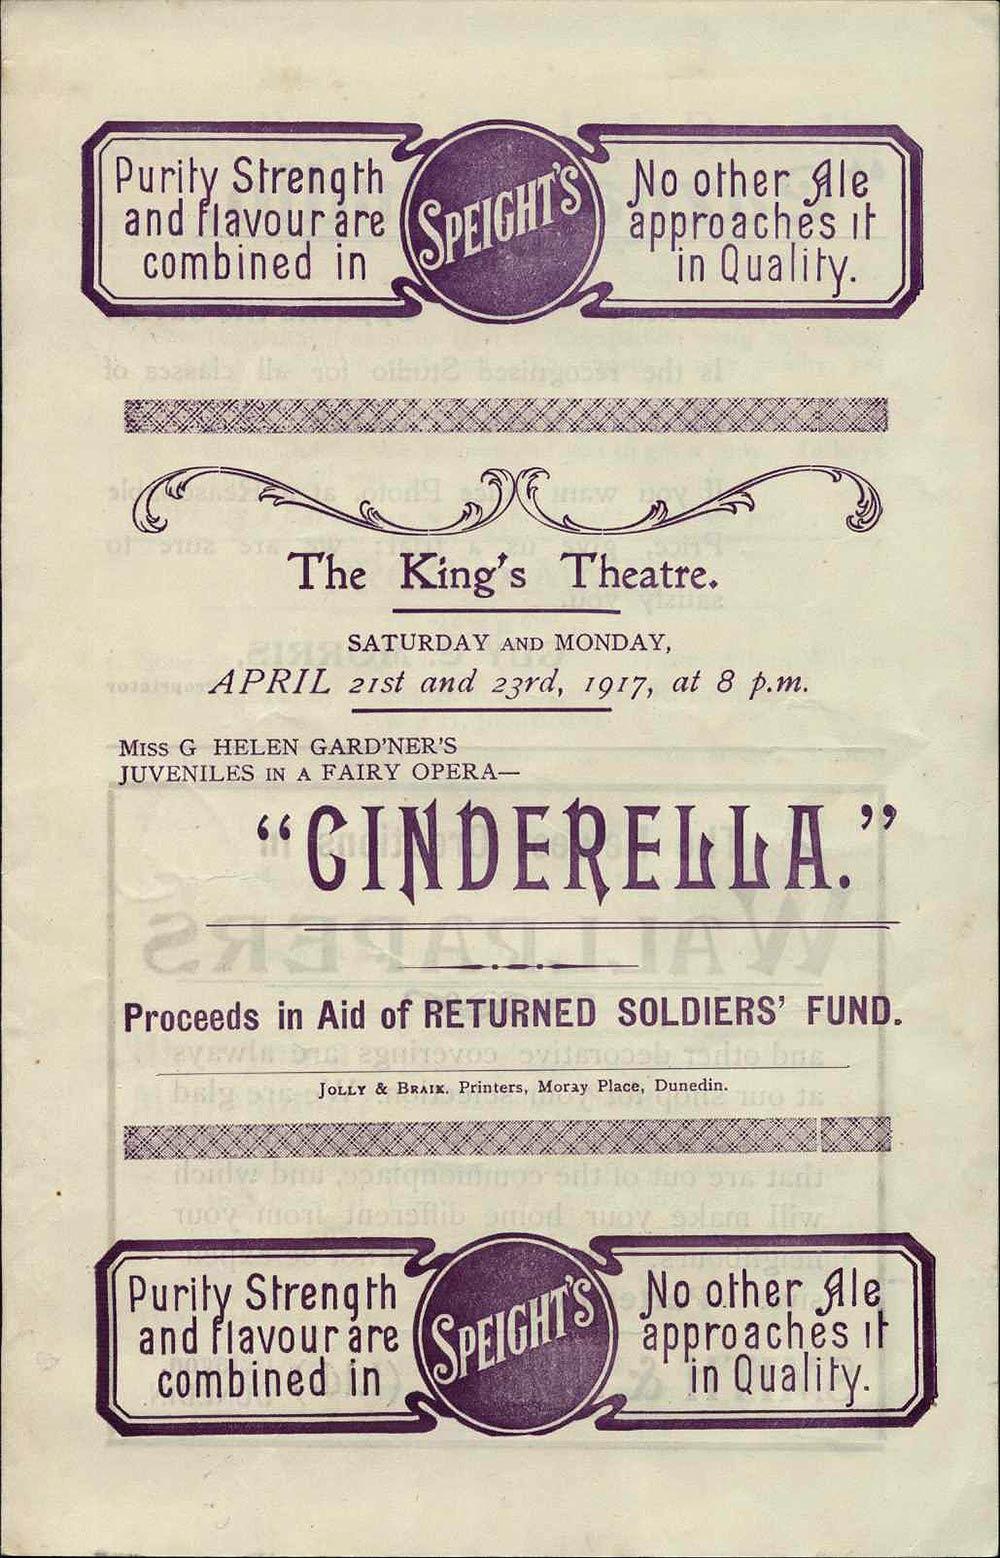 <em>Cinderella</em>. (Miss G. Helen Gardner's juveniles). King's Theatre, Dunedin, Apr. 21-23, 1917.